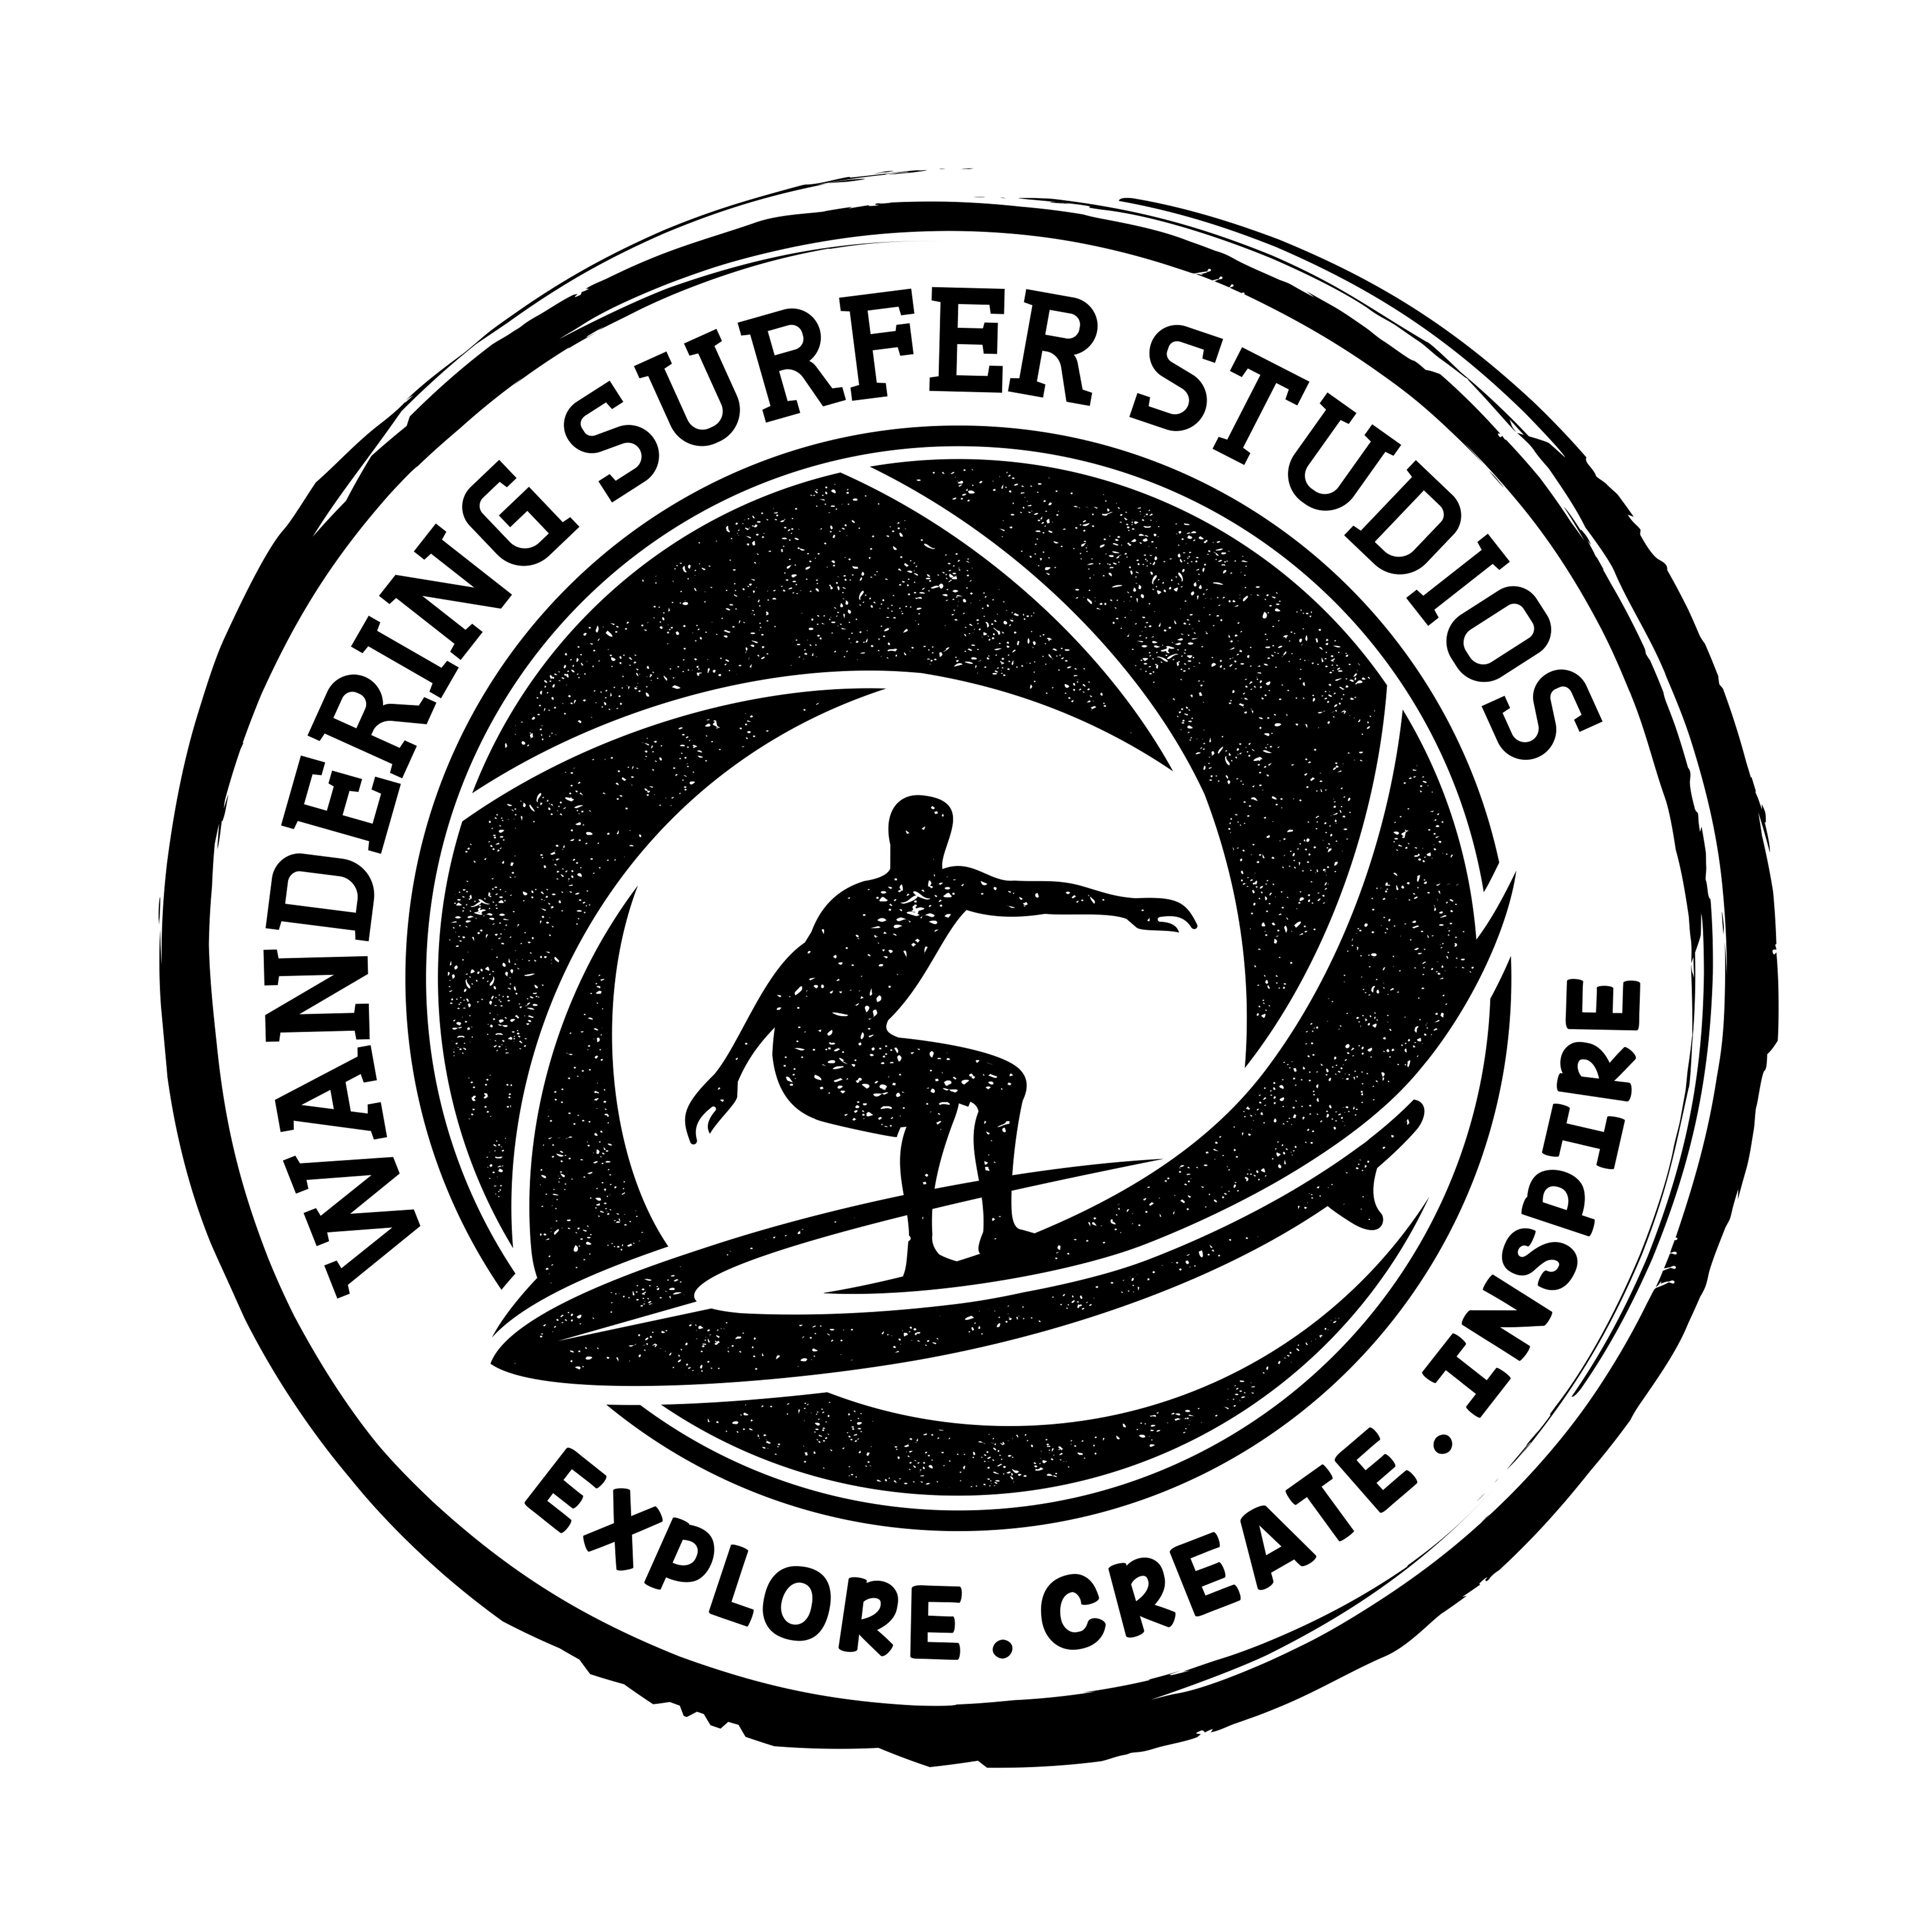 Beach Photographer needs a cool surf inspired design